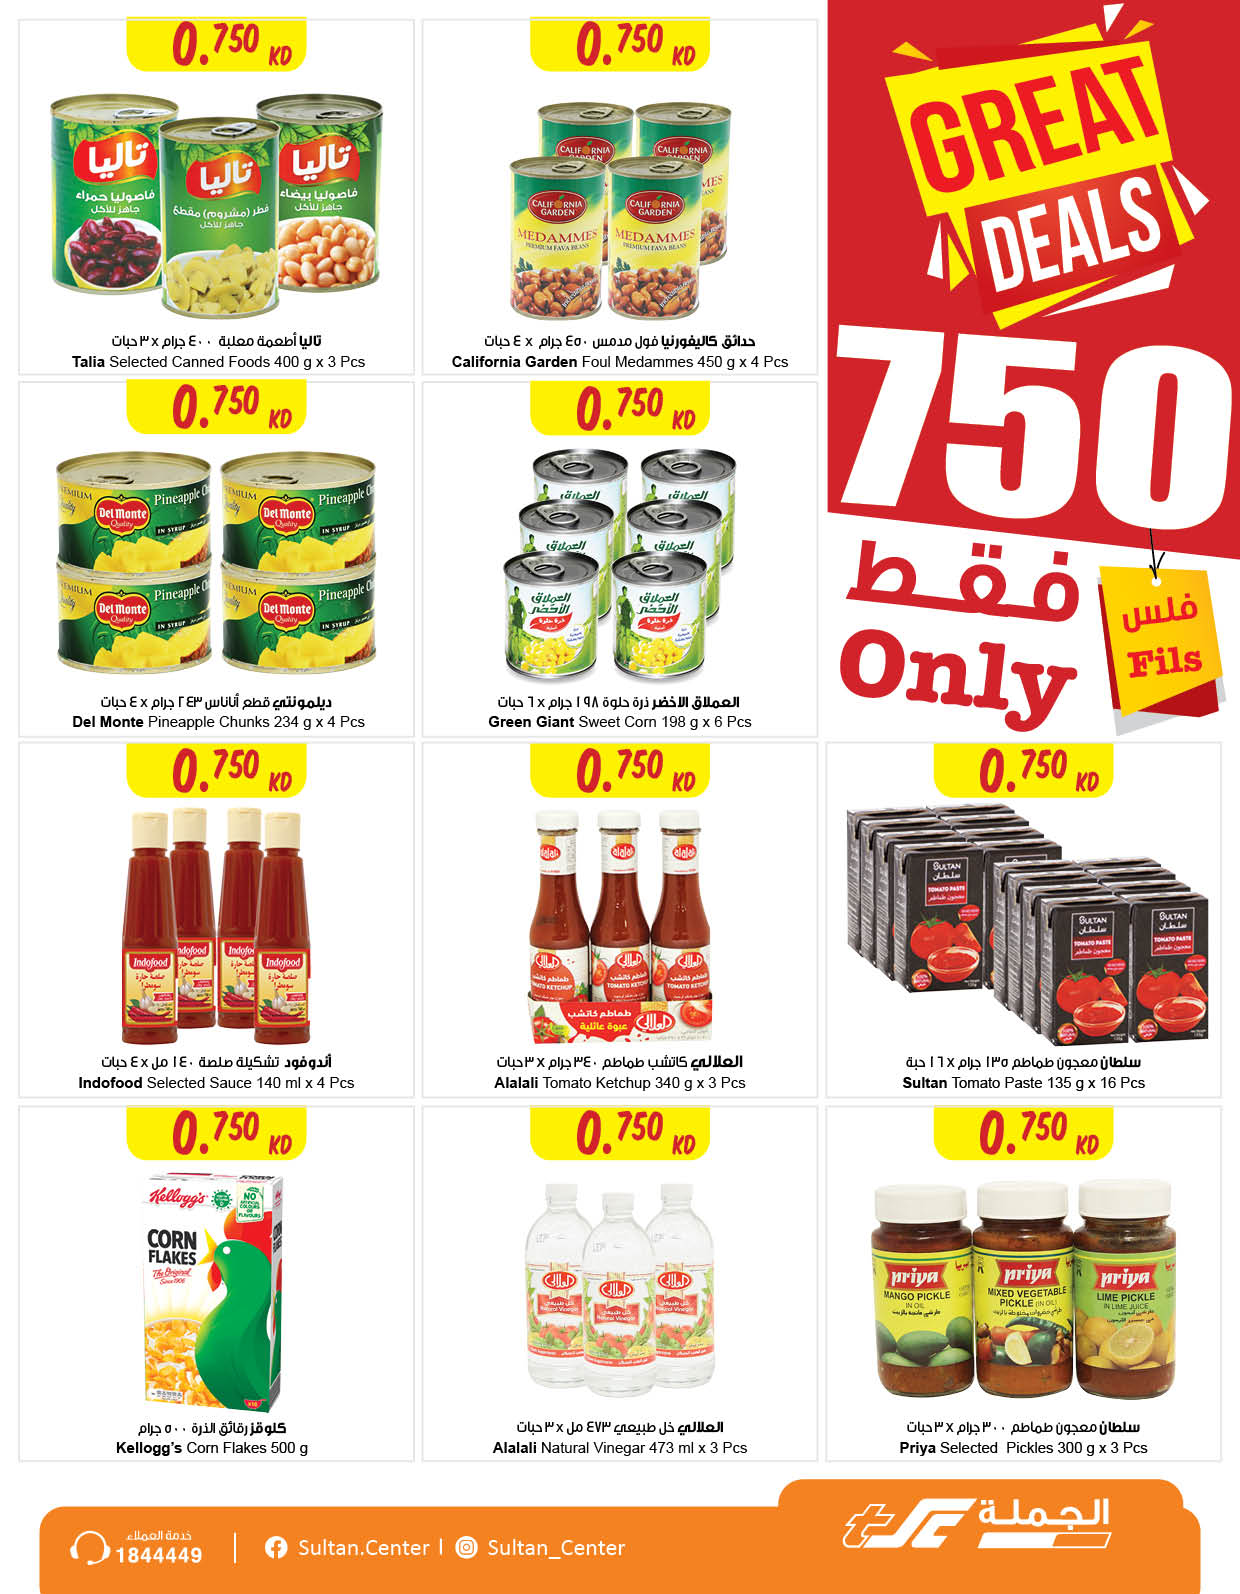 Sultan Center Weekly promotions, iiQ8, Deals in Sultan Centre Kuwait Jan 2021 4